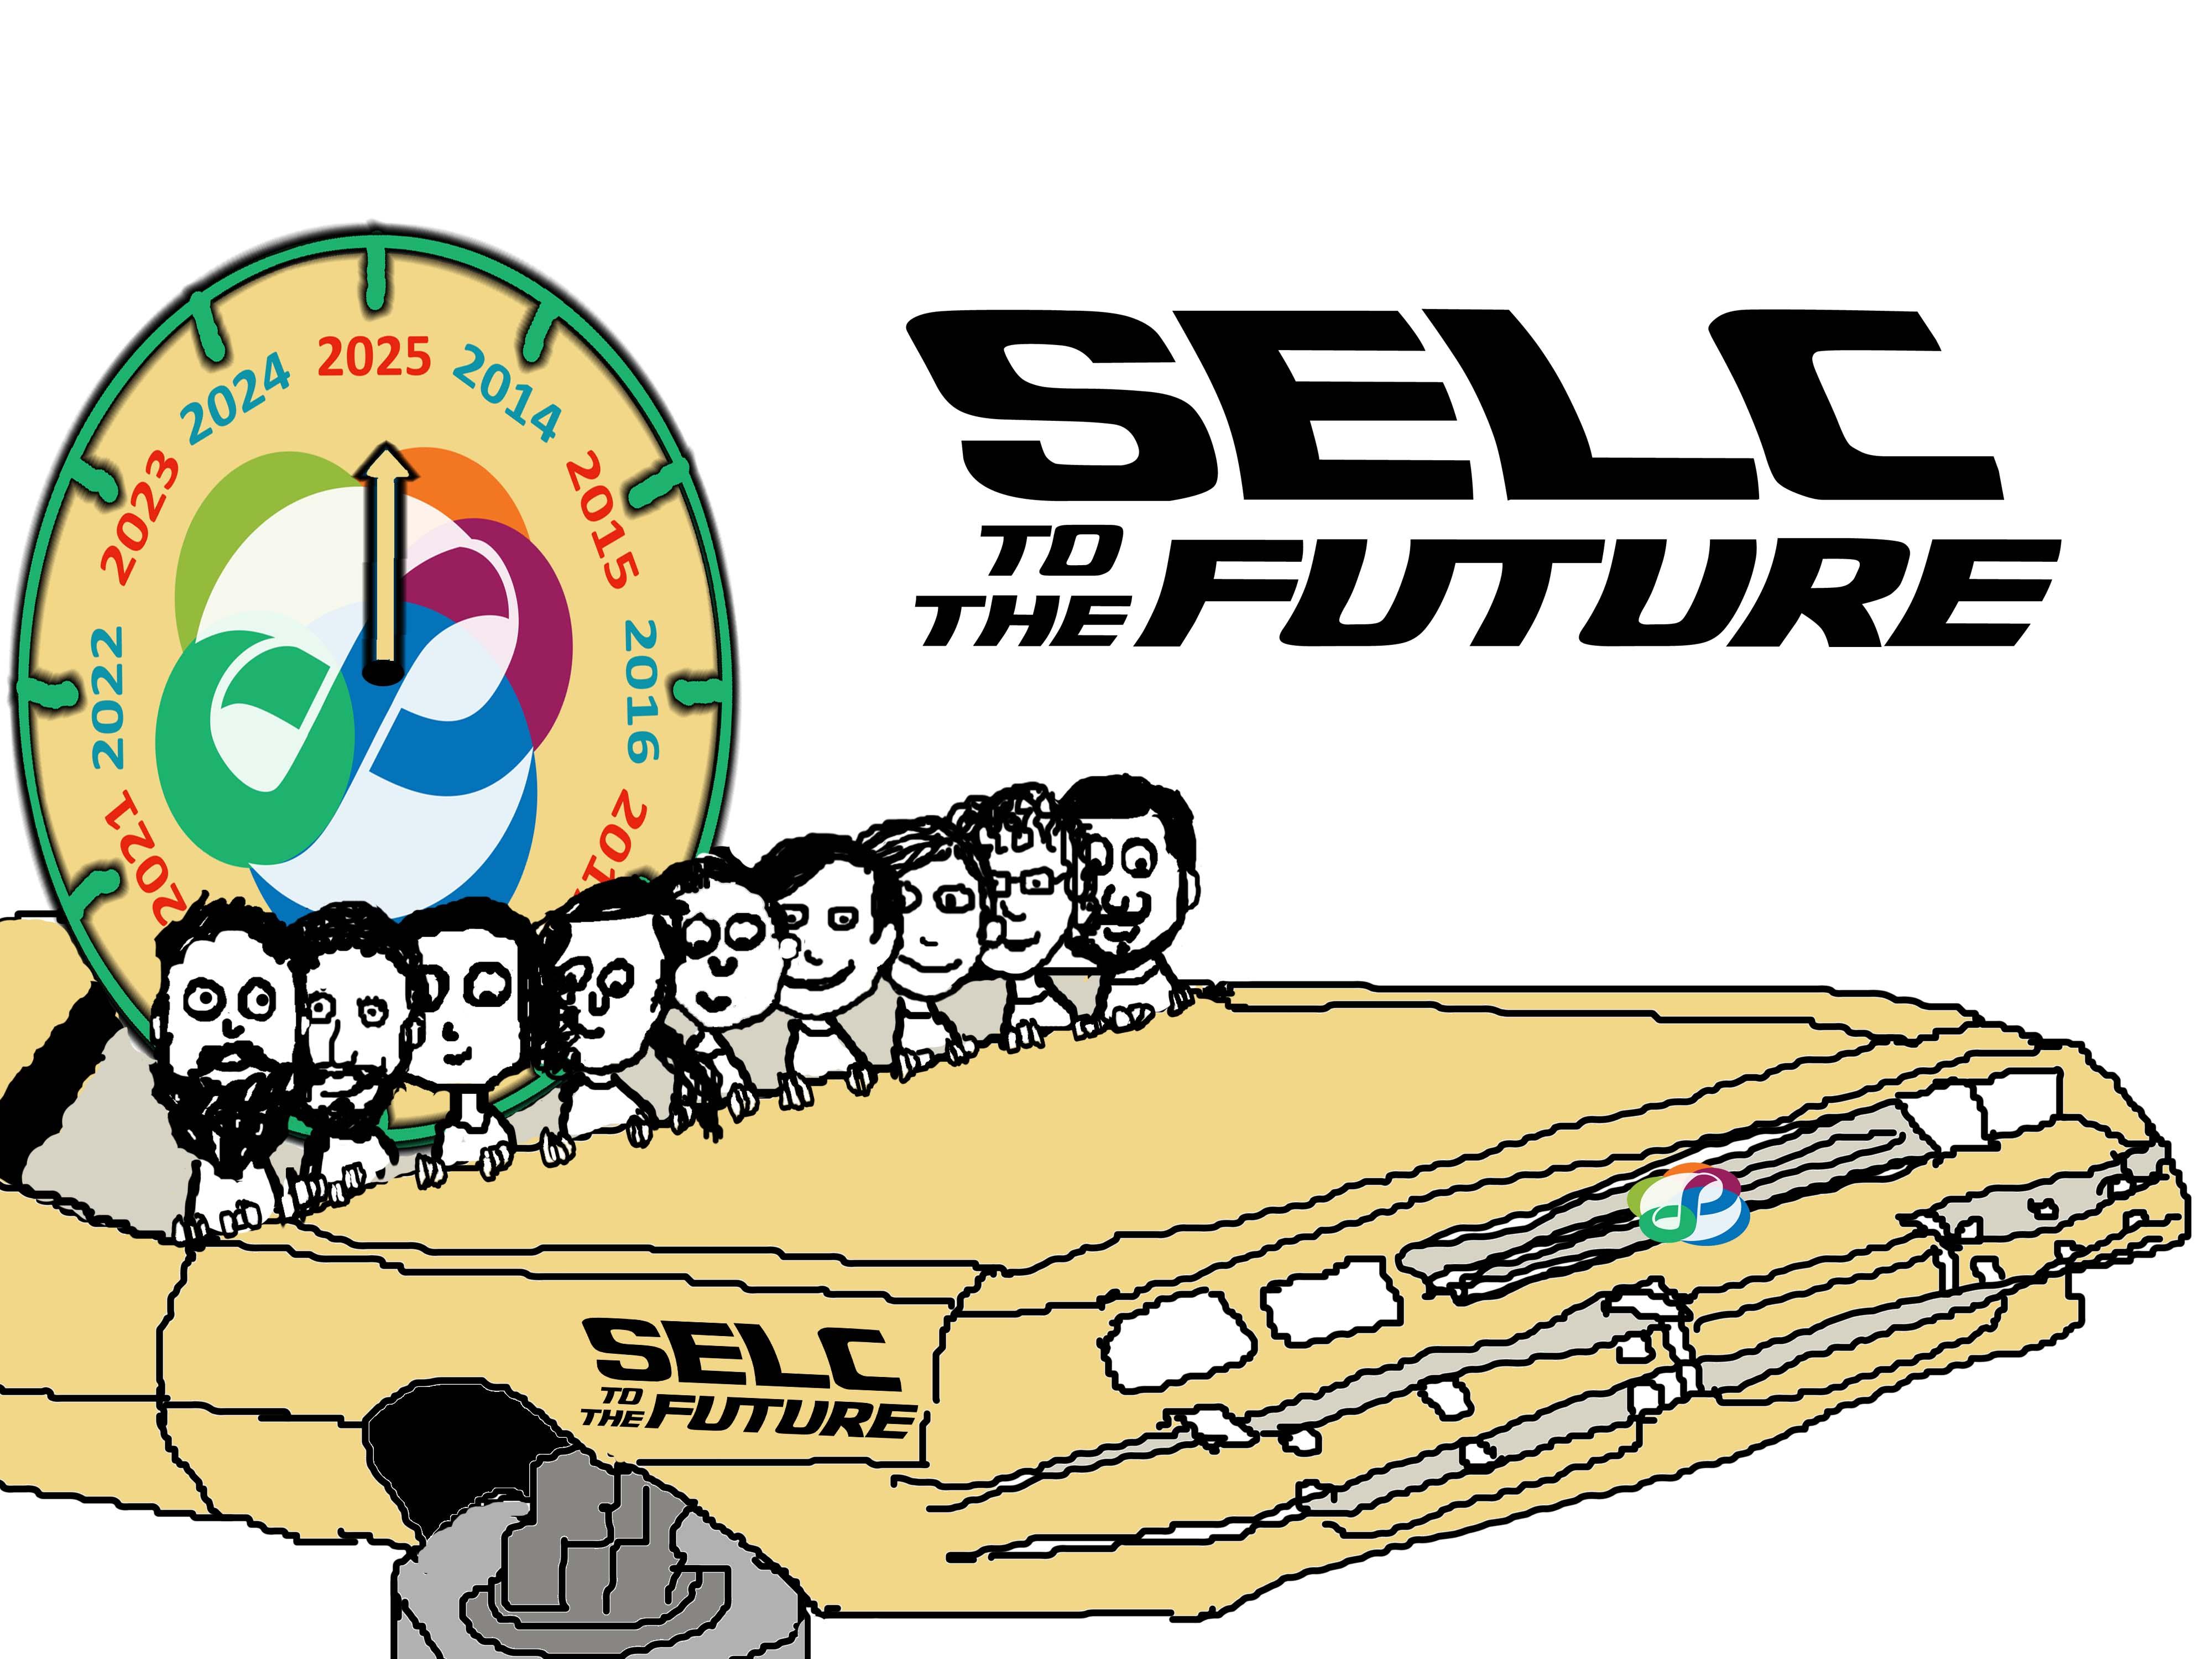 SELC to the FUTURE!!!